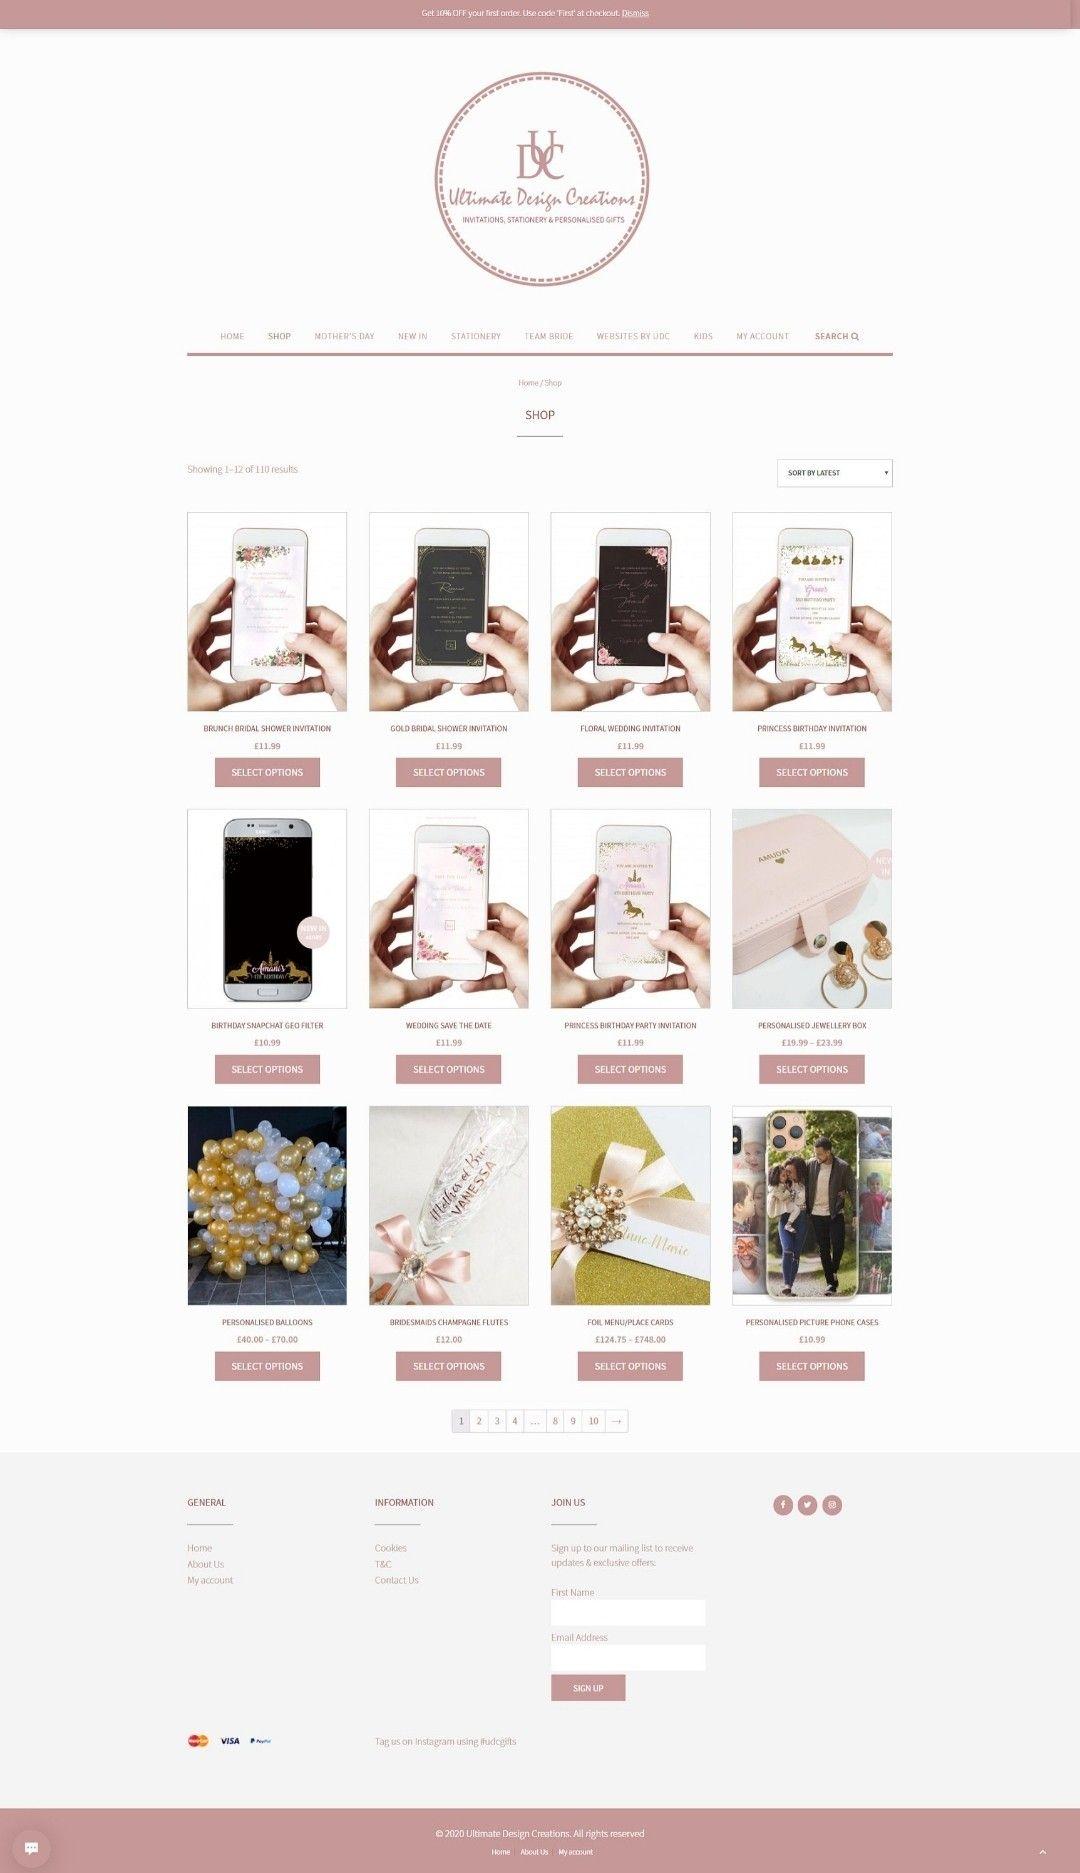 WordPress Website | Web Designer | Custom E-commerce WordPress Website | Online Web Design Store | Ecommerce Store | Custom Graphic Designer